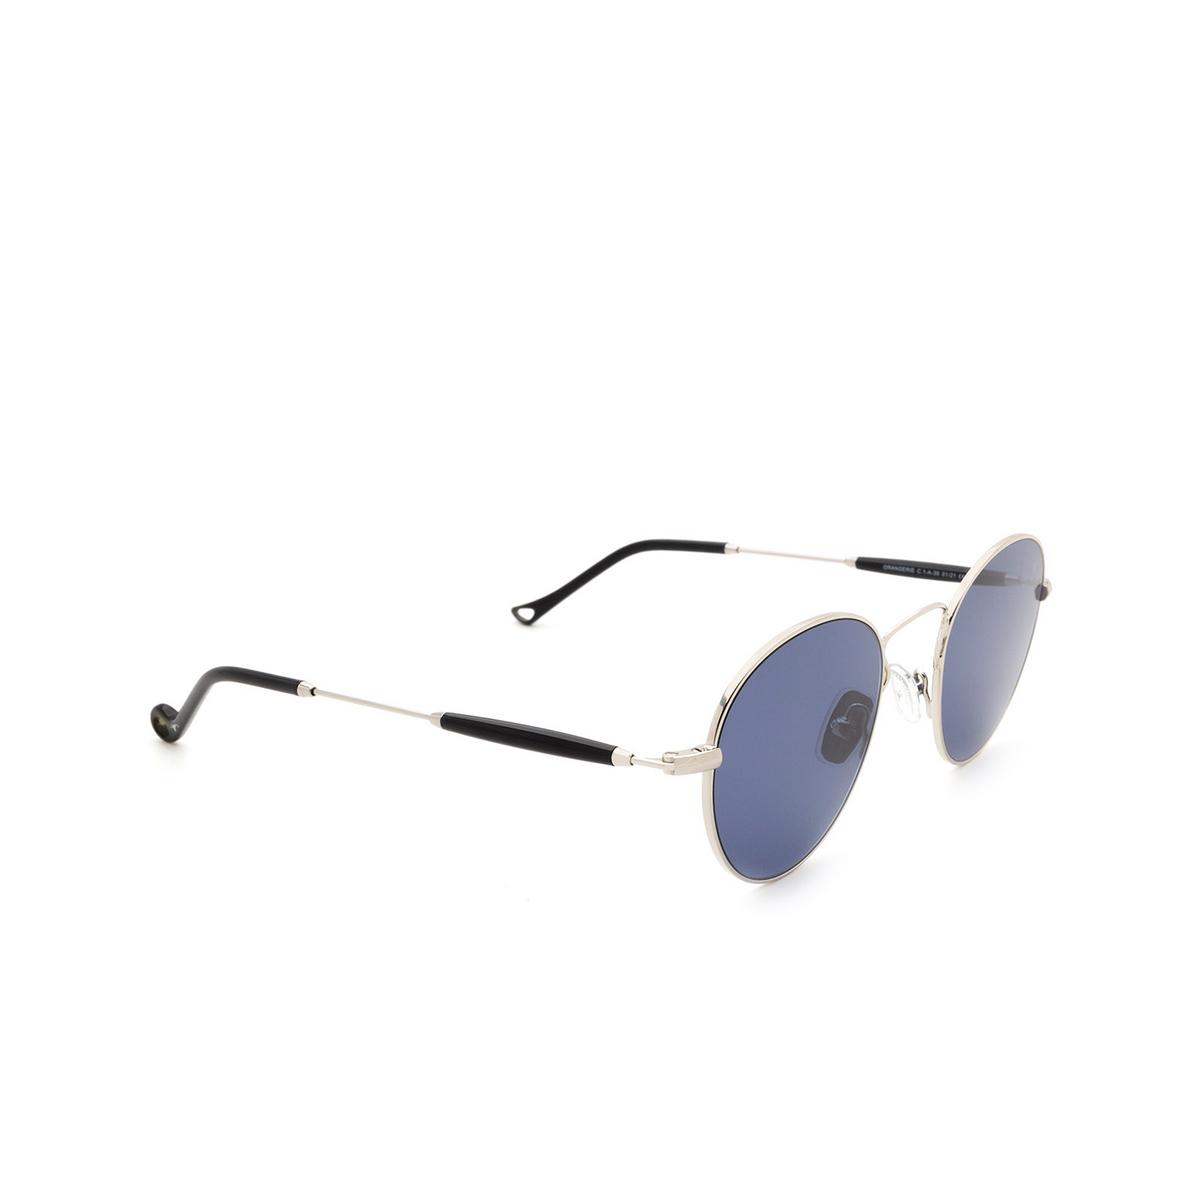 Eyepetizer® Round Sunglasses: Orangerie color Silver C.1-A-39 - three-quarters view.